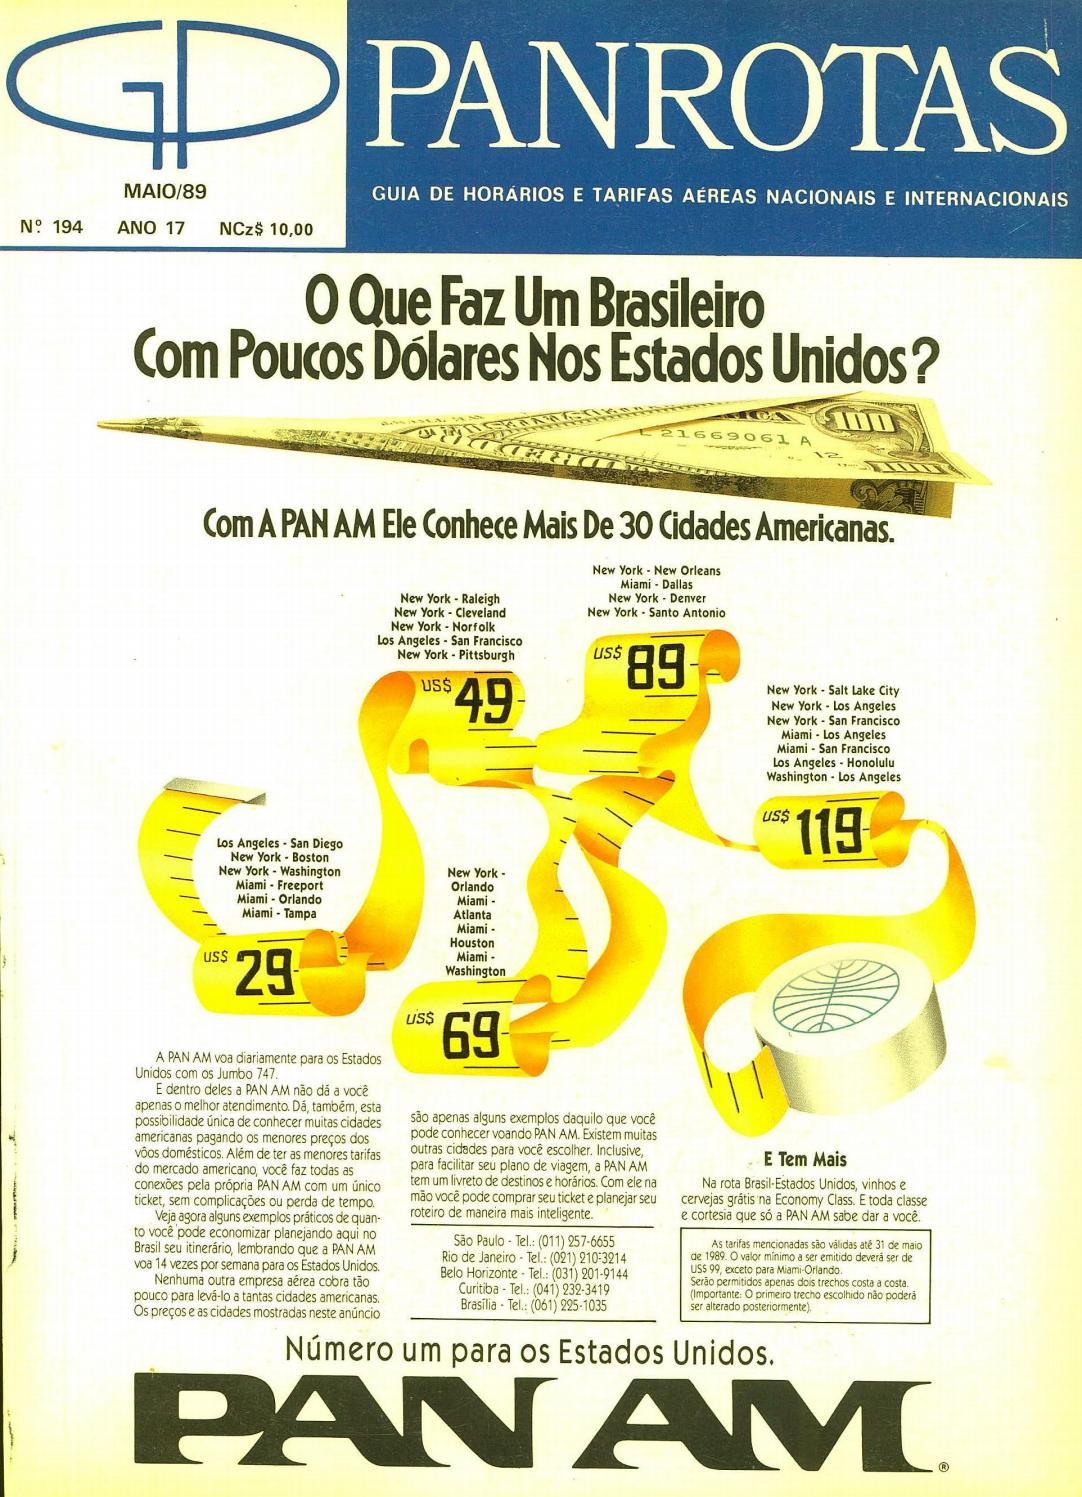 1d0f8b28bf7 Guia PANROTAS - Edição 194 - Maio 1989 by PANROTAS Editora - issuu